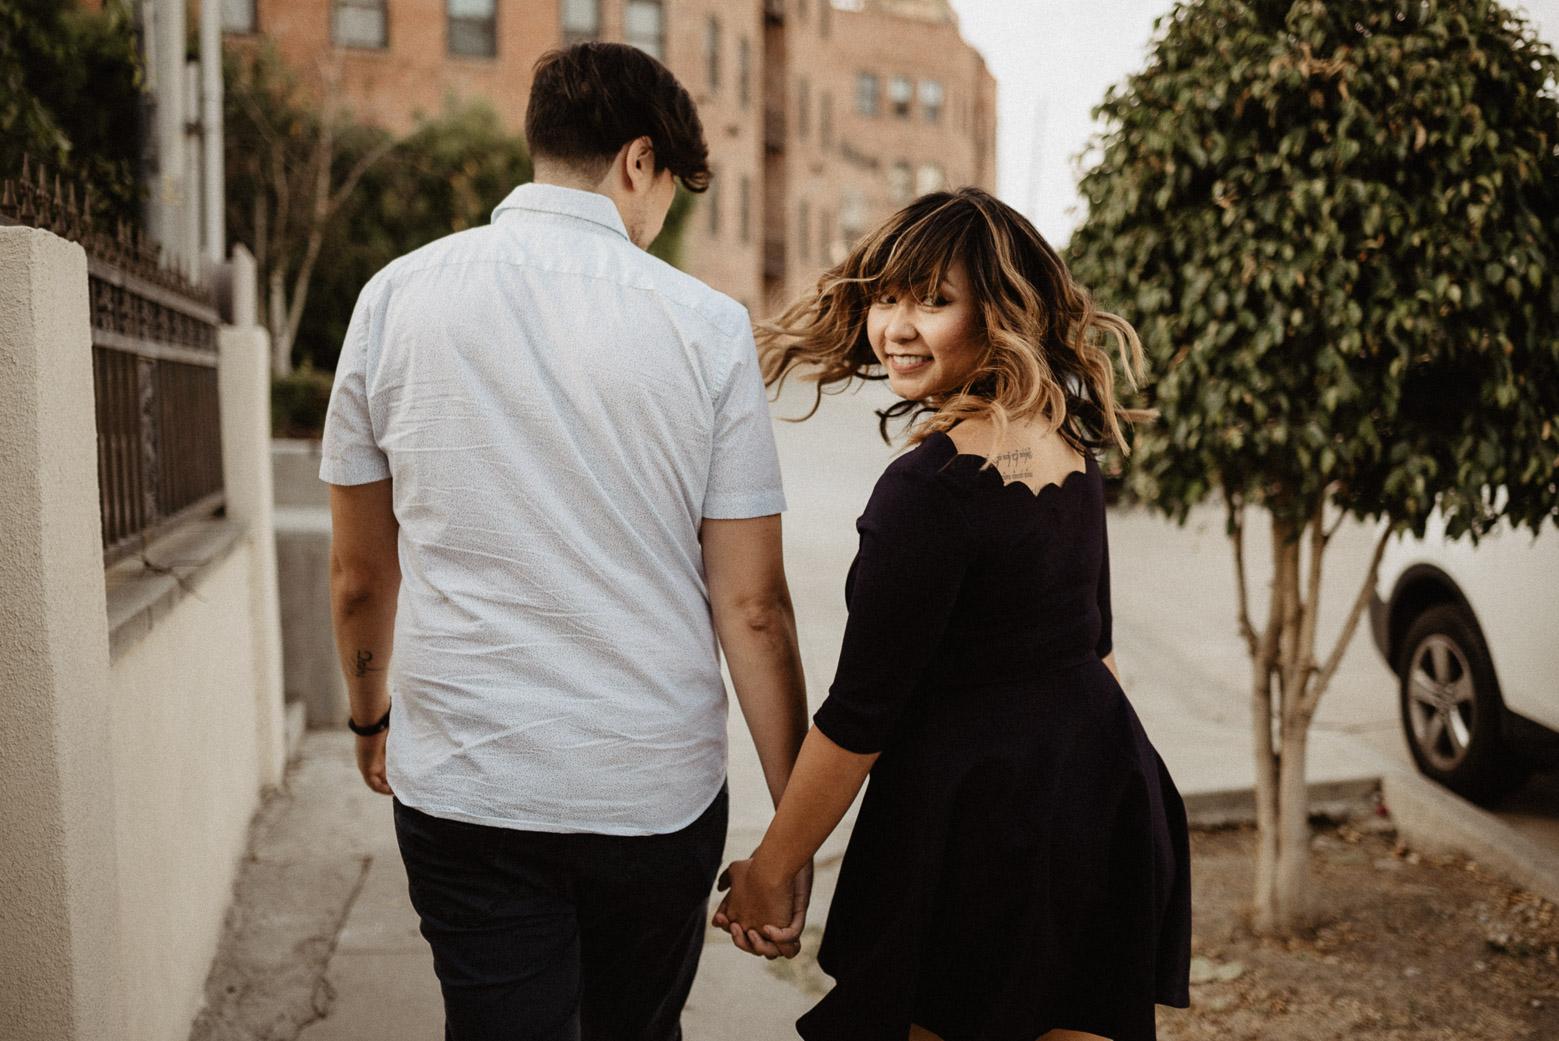 brocoffphotography.com| Brocoff Photography | Southern California Wedding Photographers | downtown LA | silver lake engagement